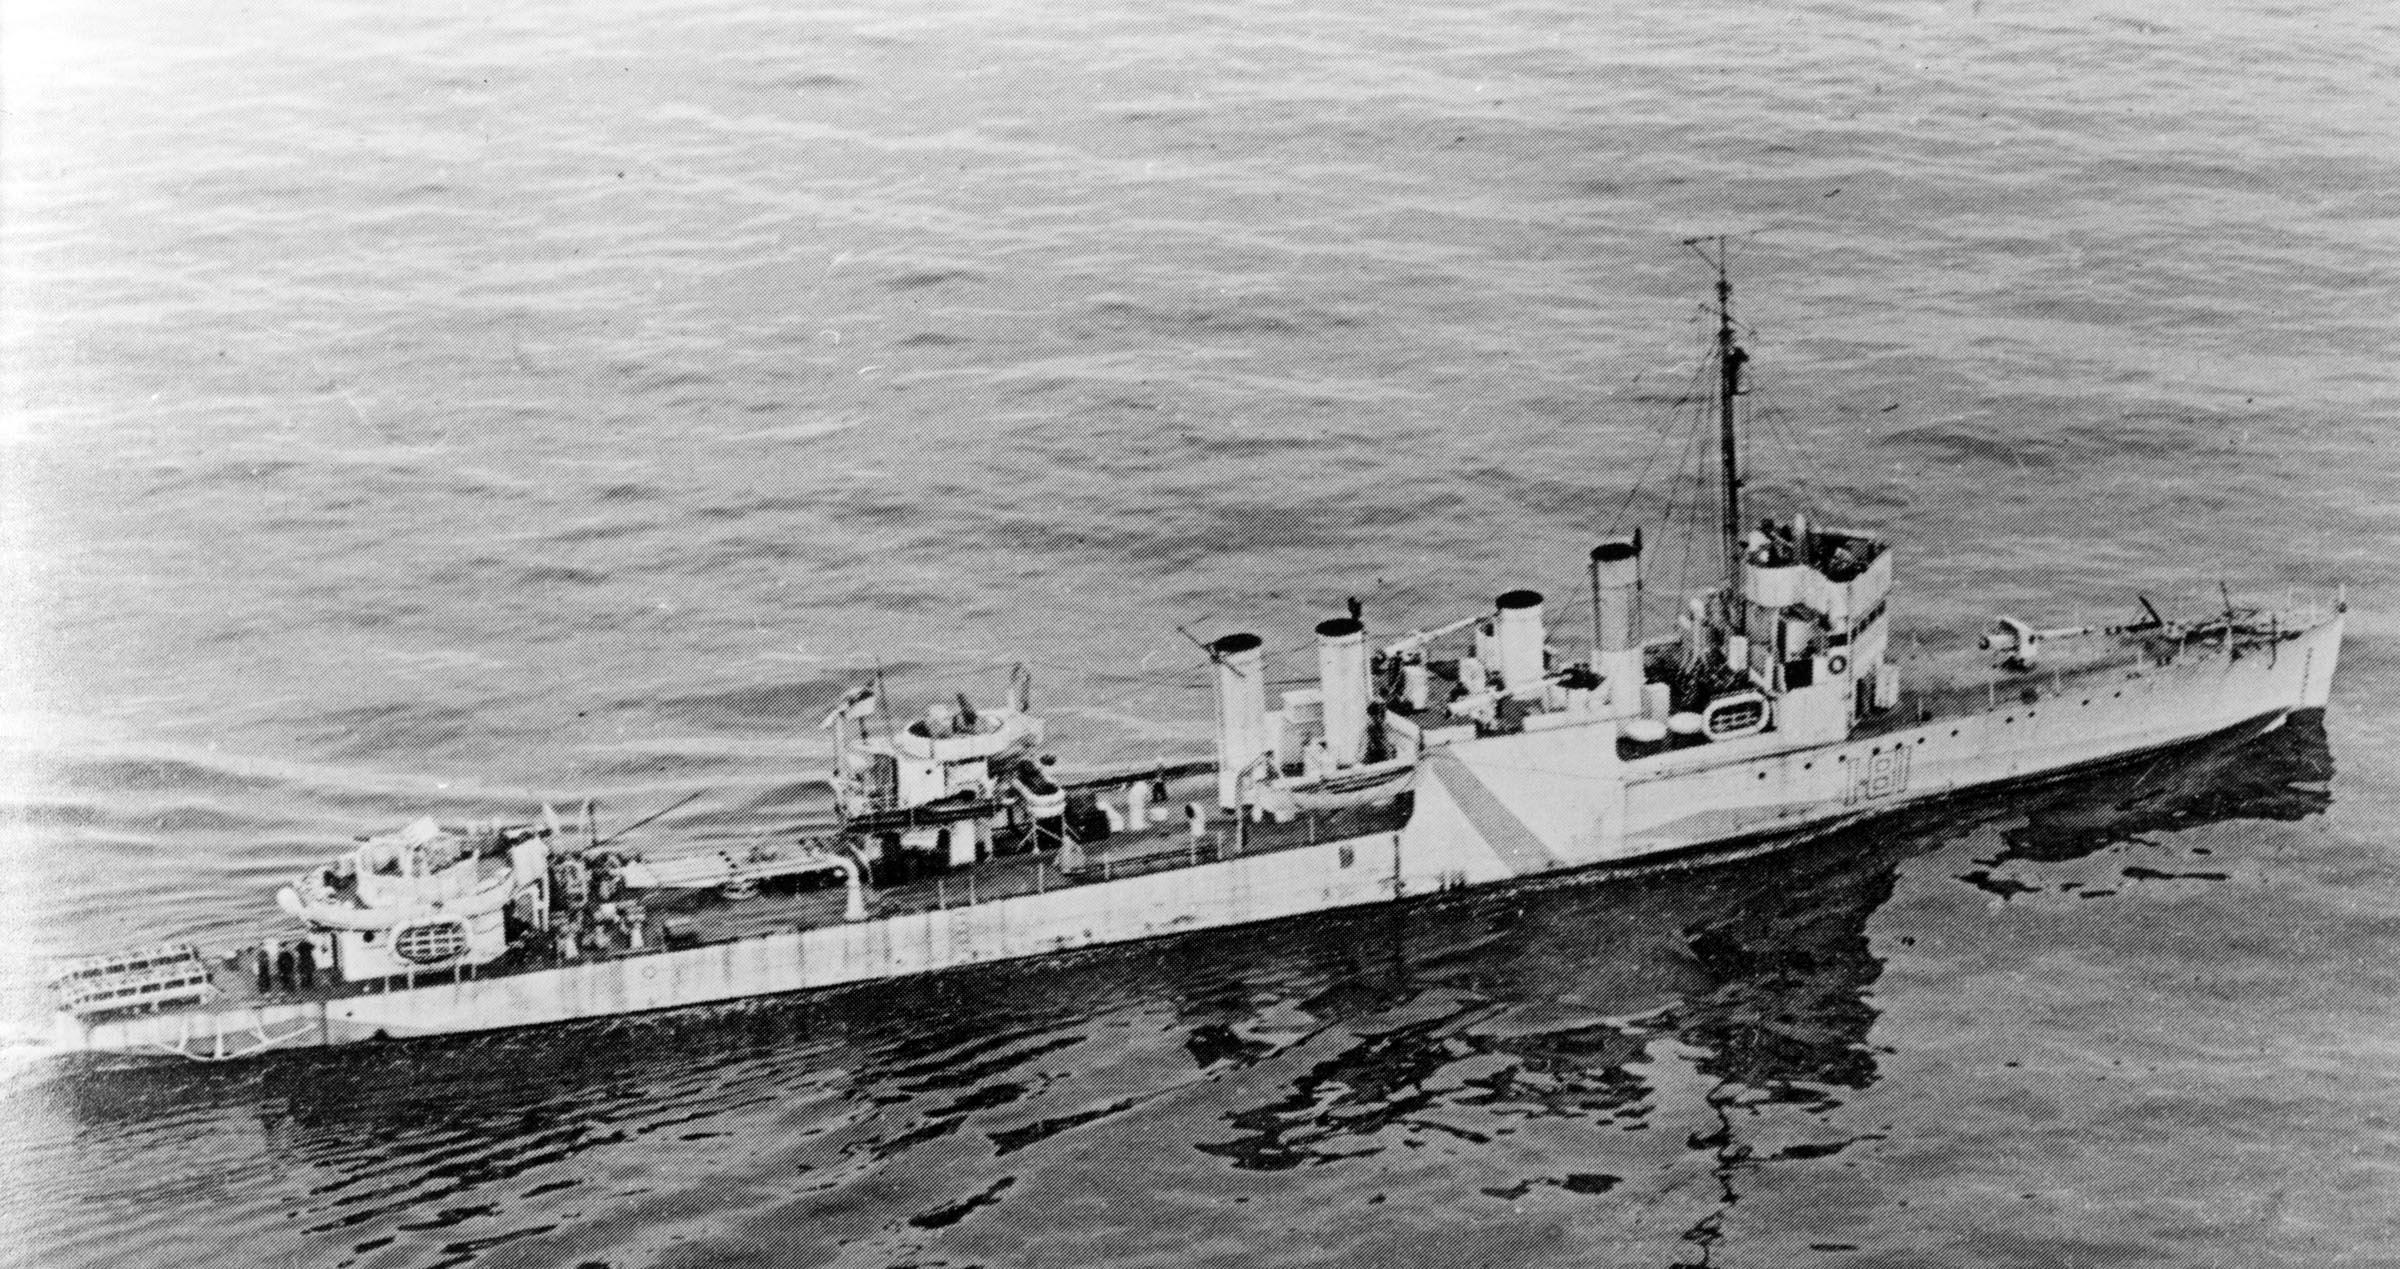 HMCS ST. CROIX (1st)